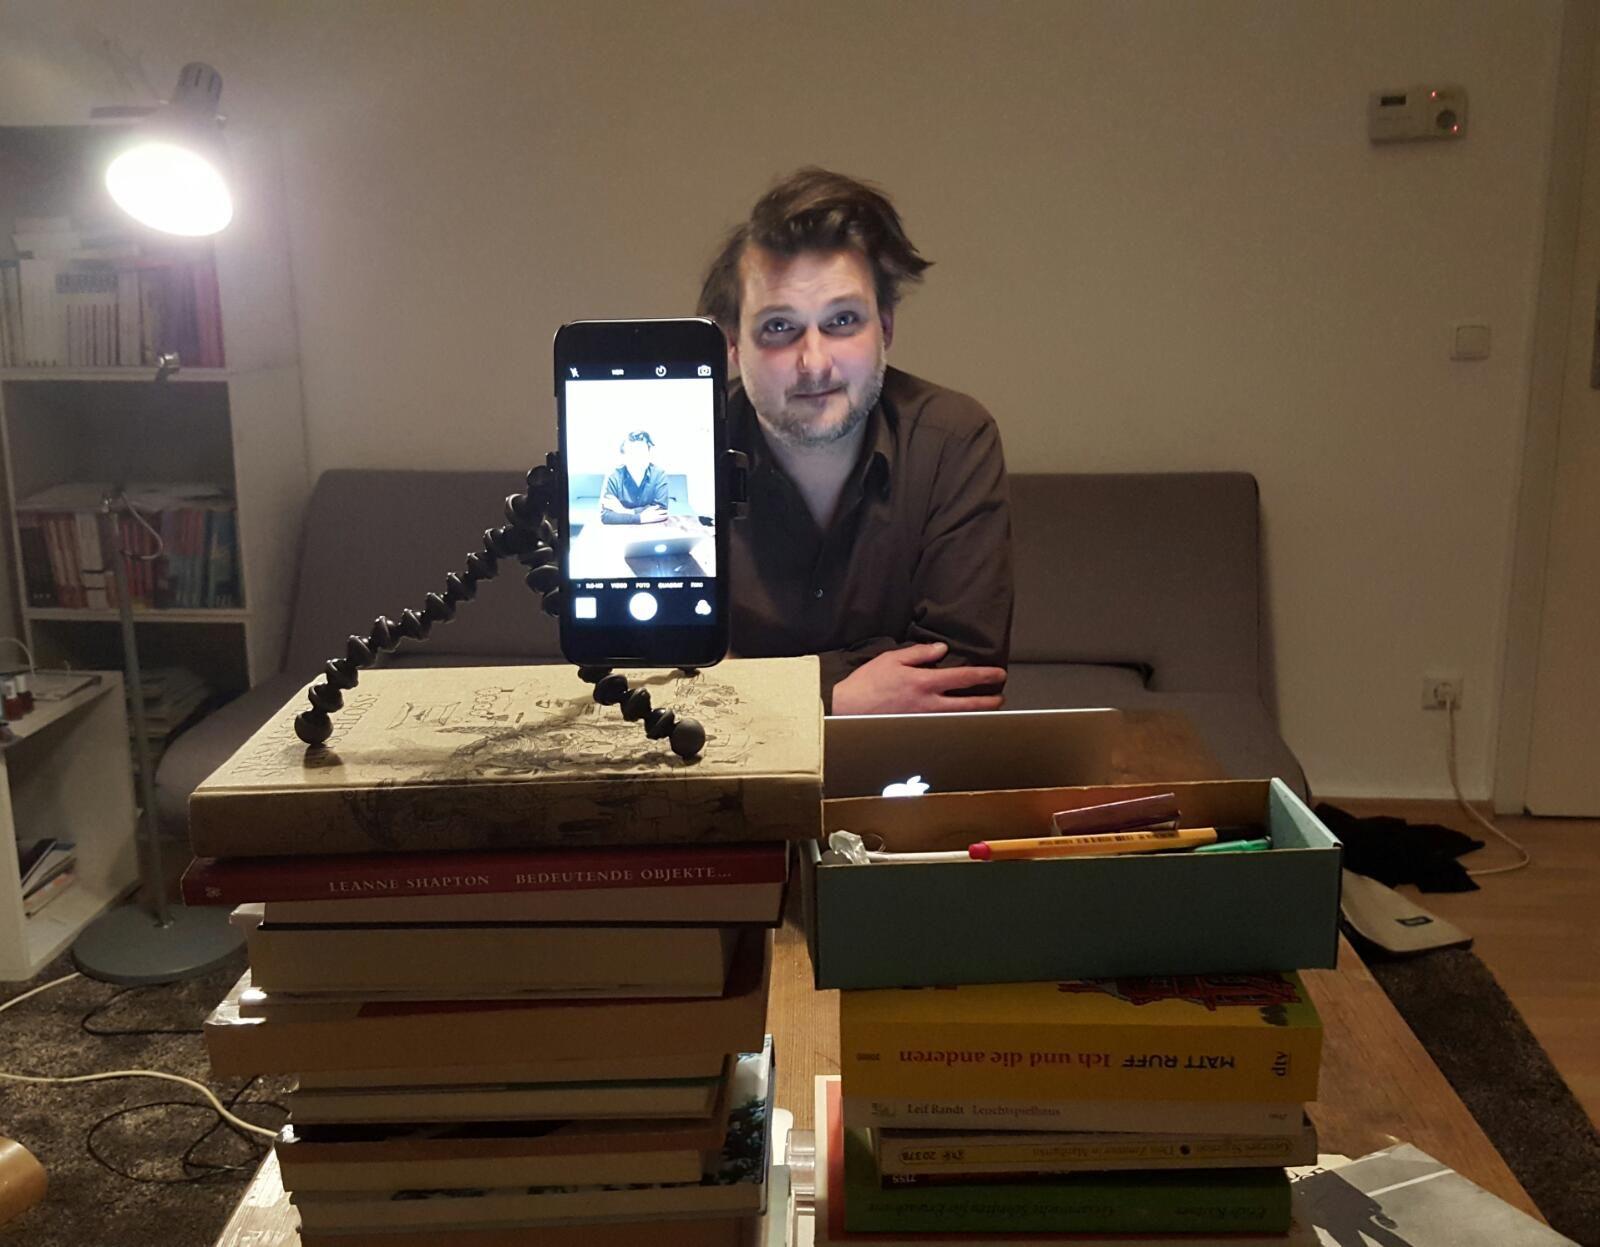 livestream_selfie